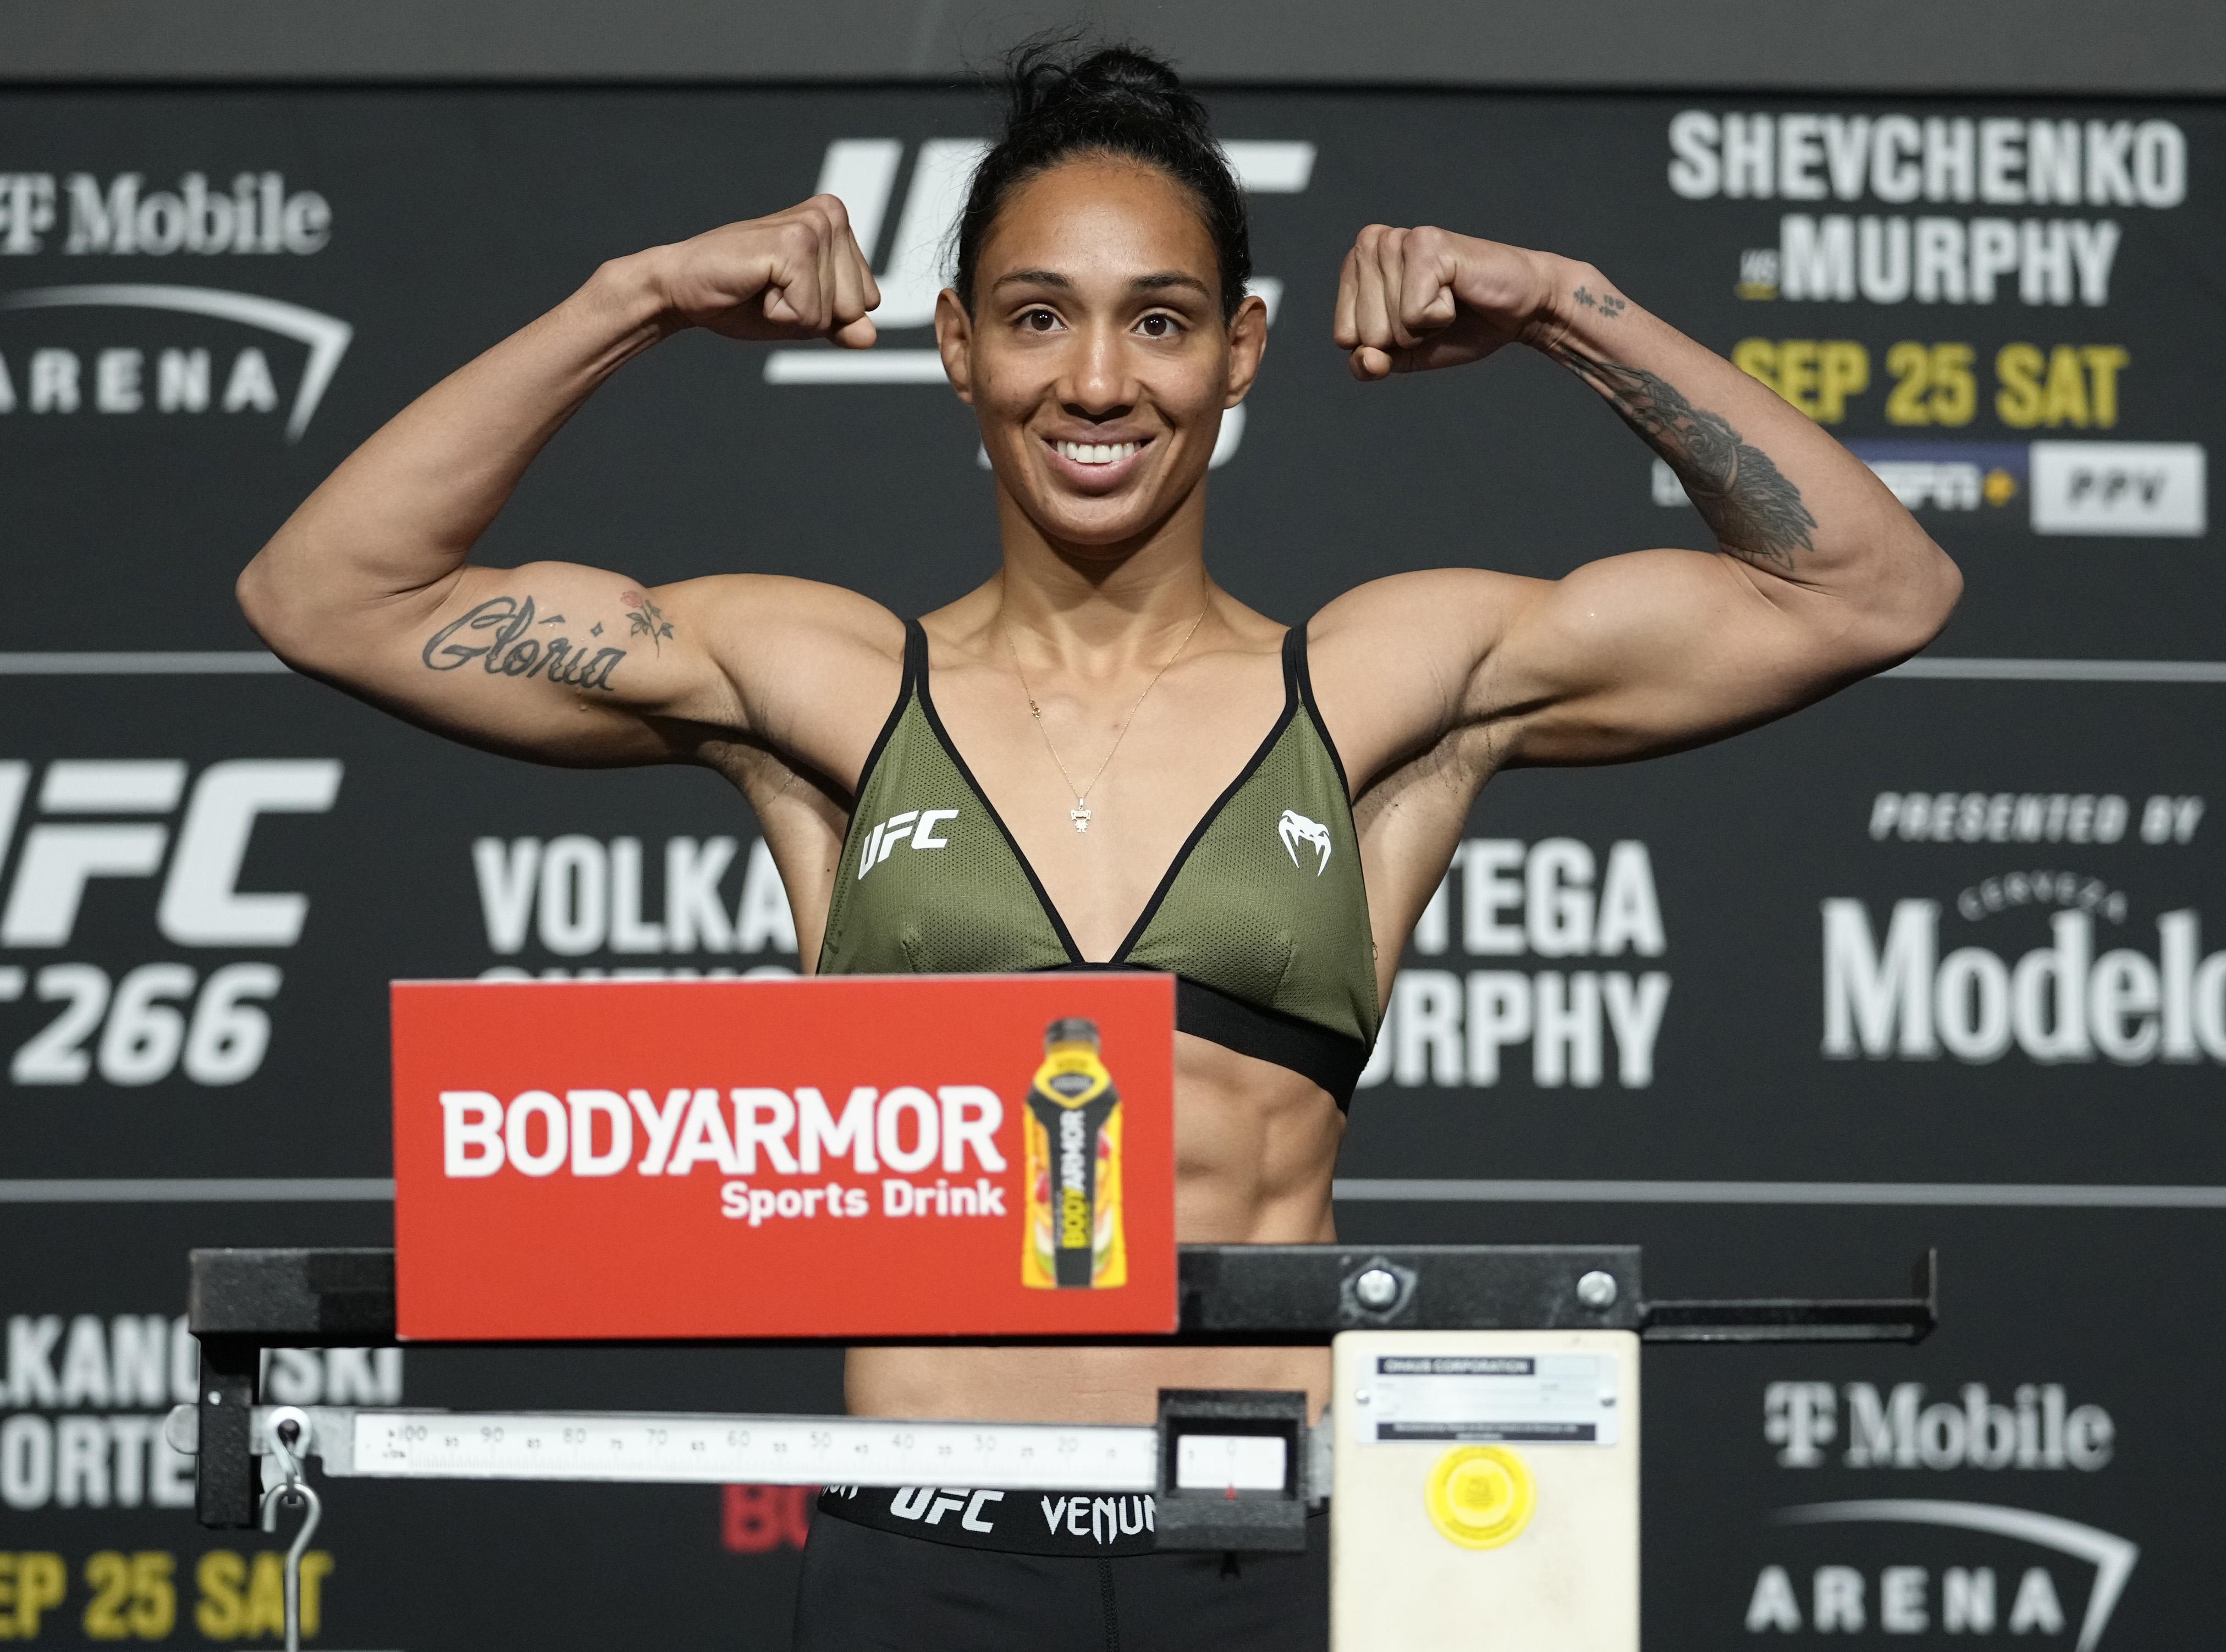 Taila Santos is set to face Roxanne Modafferi at UFC 266.